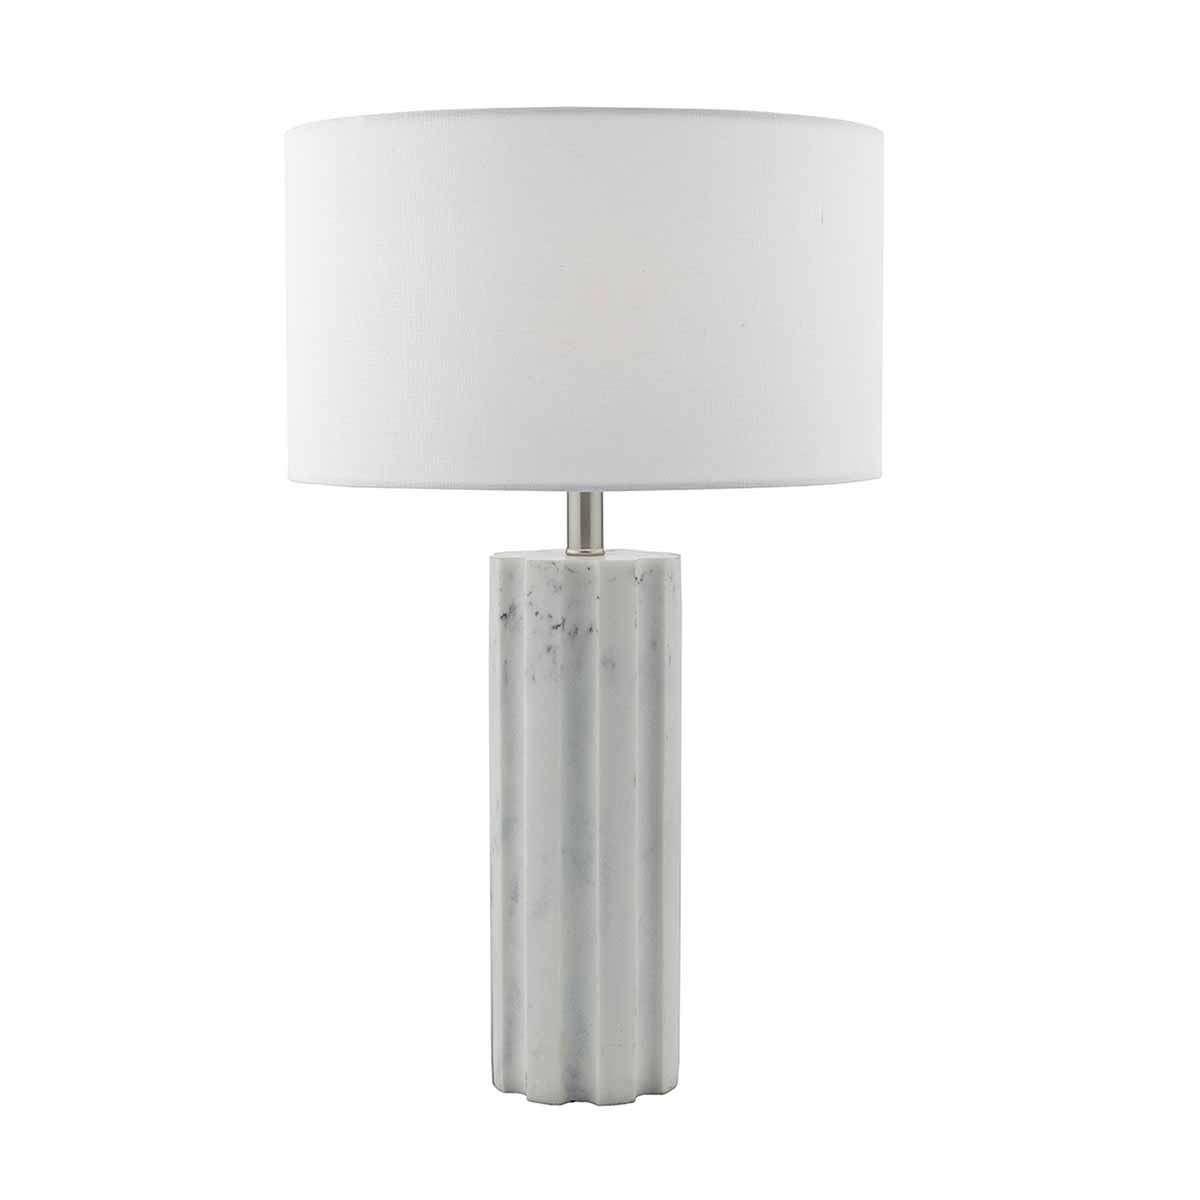 Erebus Table Lamp Stone c/w White Linen Shade